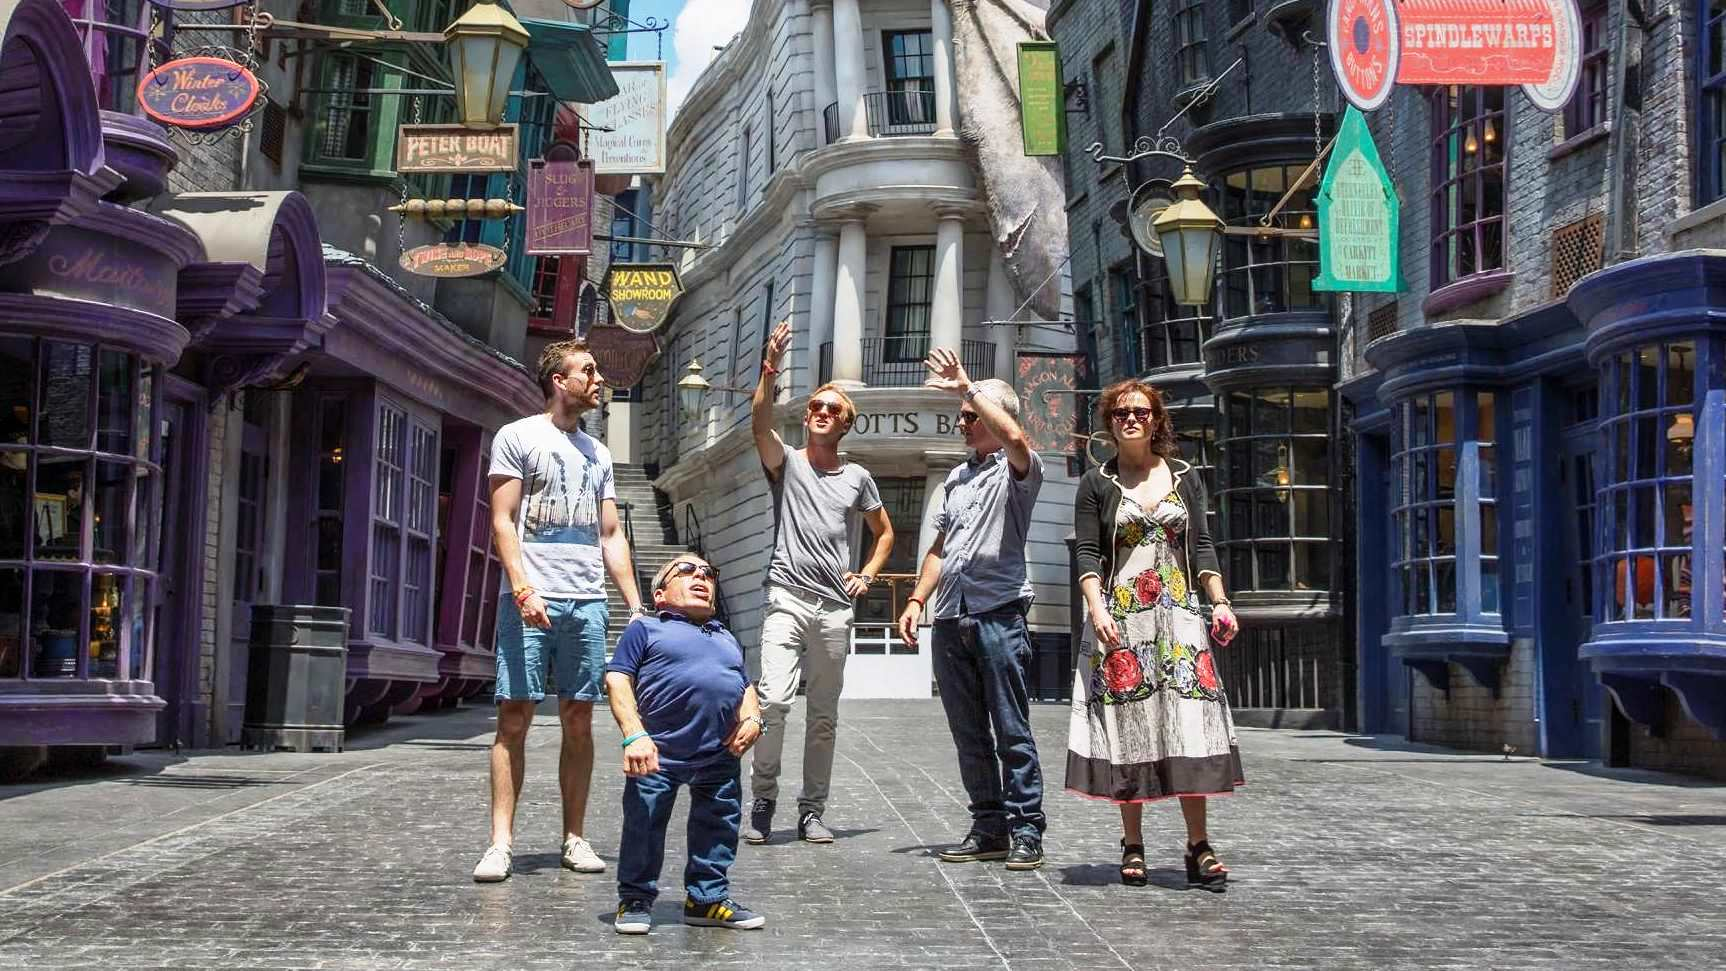 Harry Potter stars tour Diagon Alley